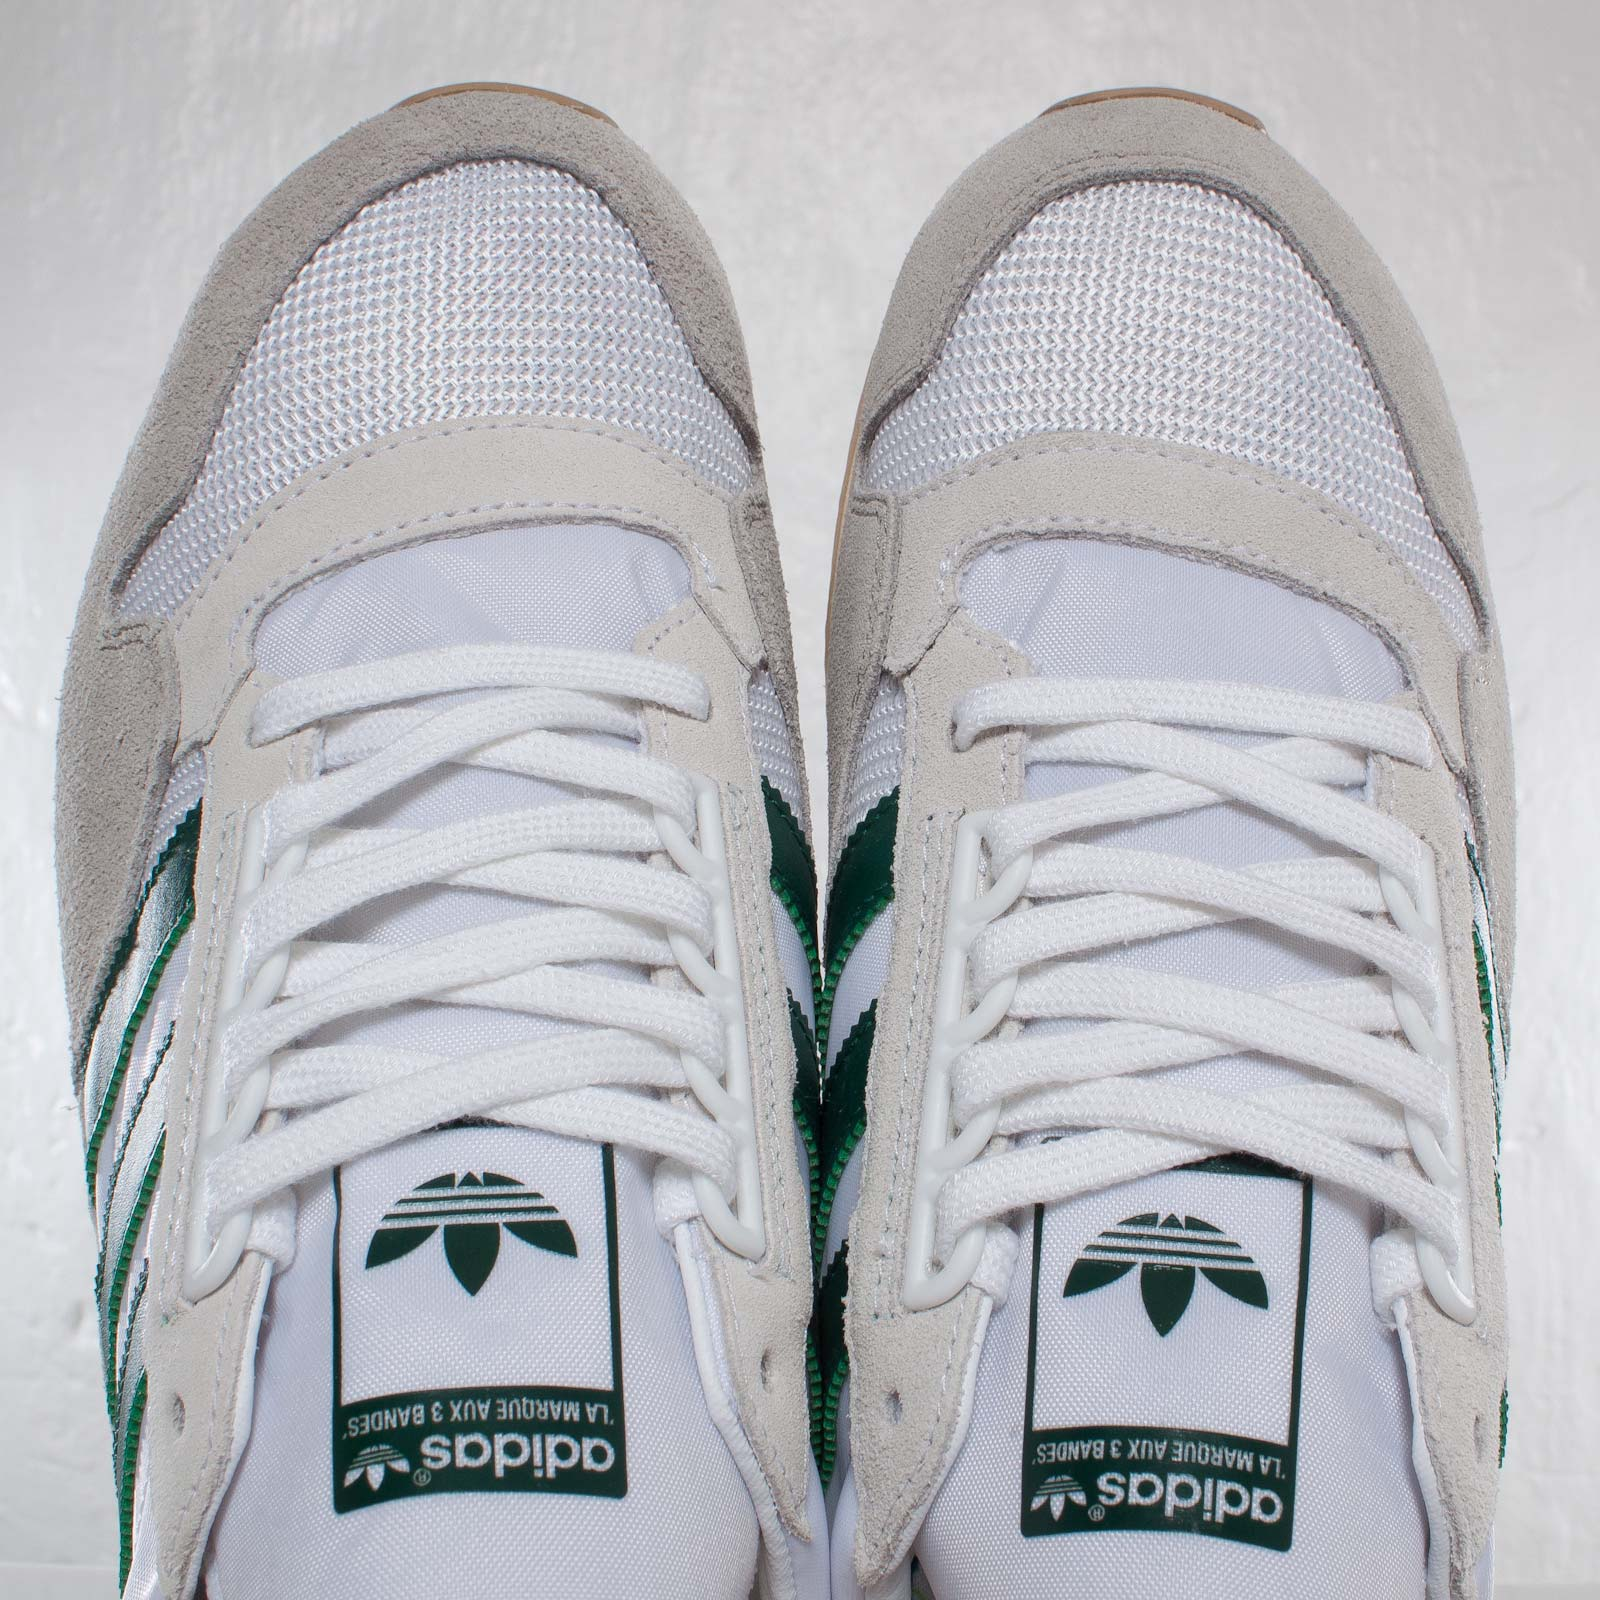 69ad8d62597be adidas ZX 500 OG UA - Q33994 - Sneakersnstuff